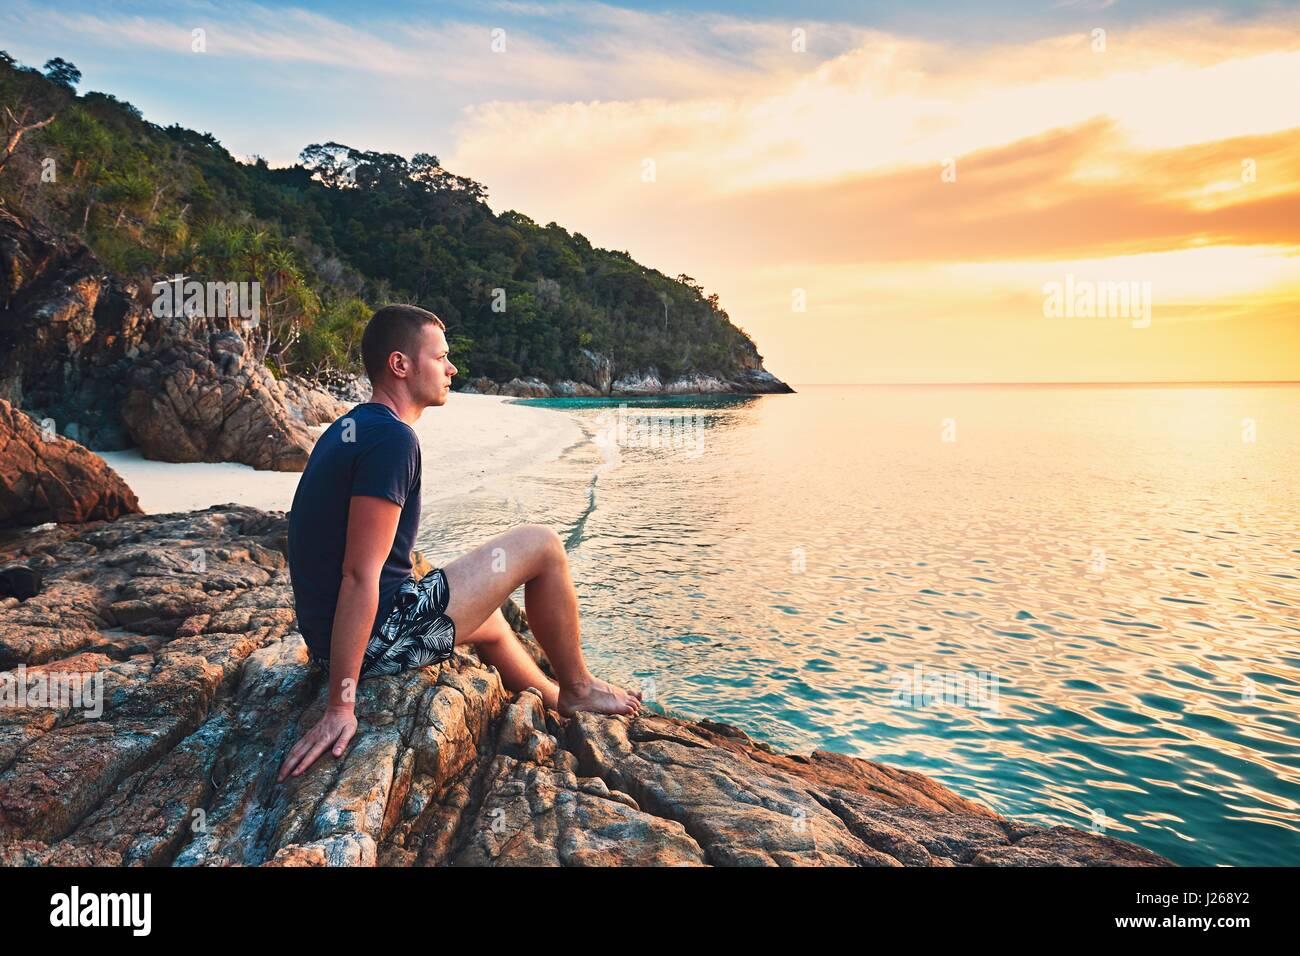 Betrachtung auf den Sonnenuntergang. Allein junger Mann am schönen Sandstrand. Stockbild